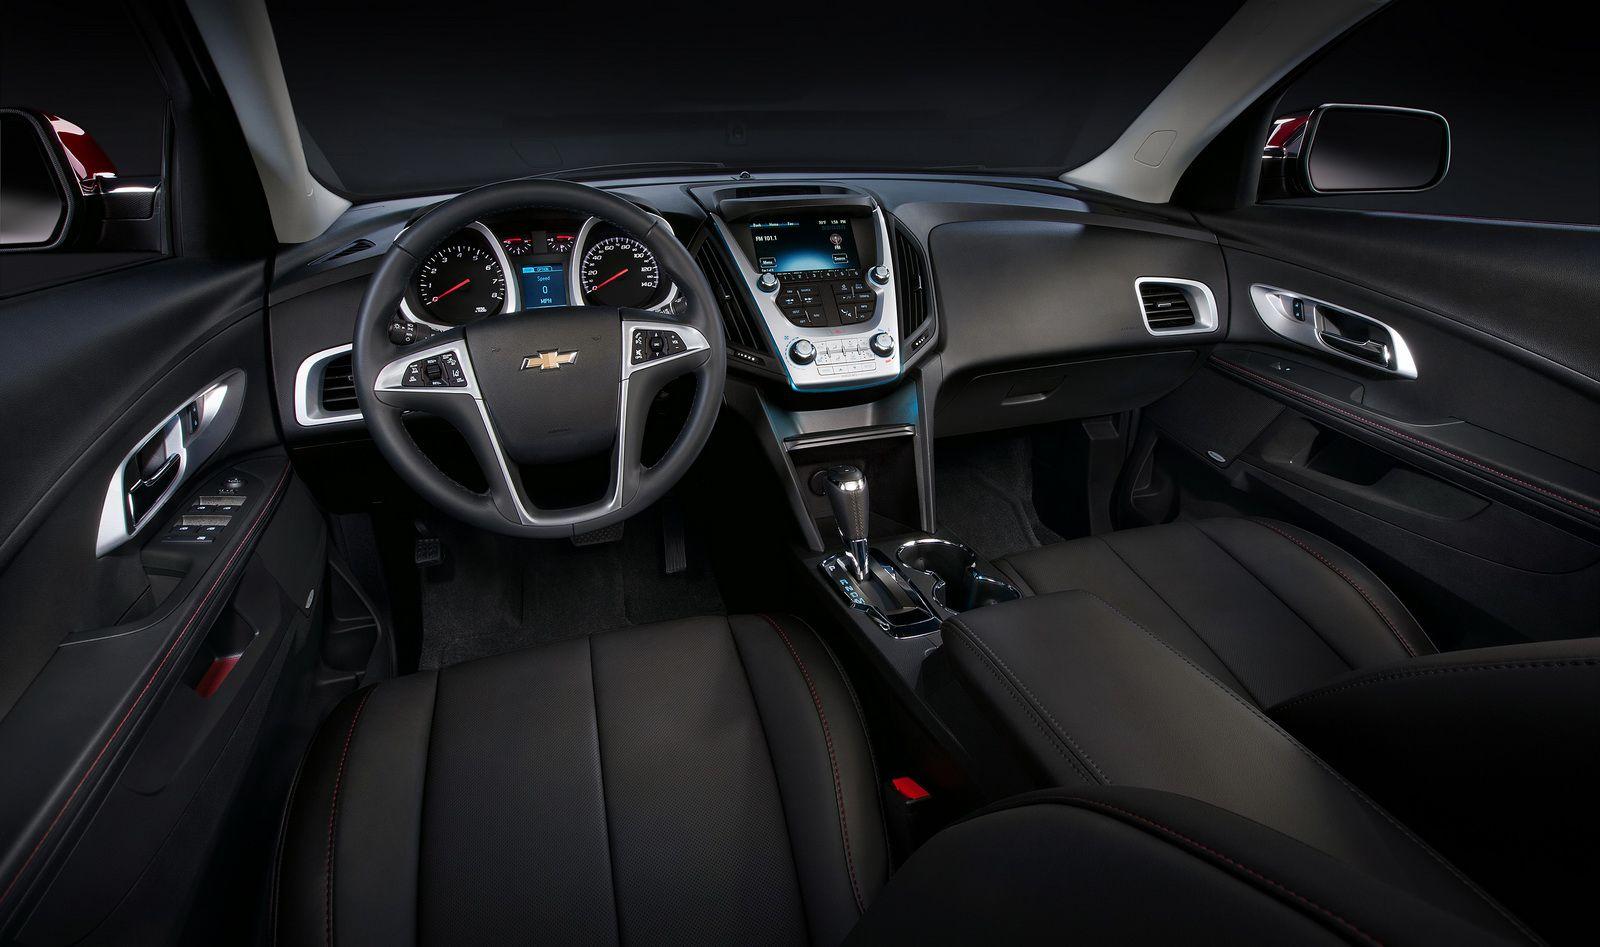 2019 Equinox Small Suv Interior Photo Of The Dashboard Chevrolet Equinox Chevy Equinox Fuel Efficient Suv